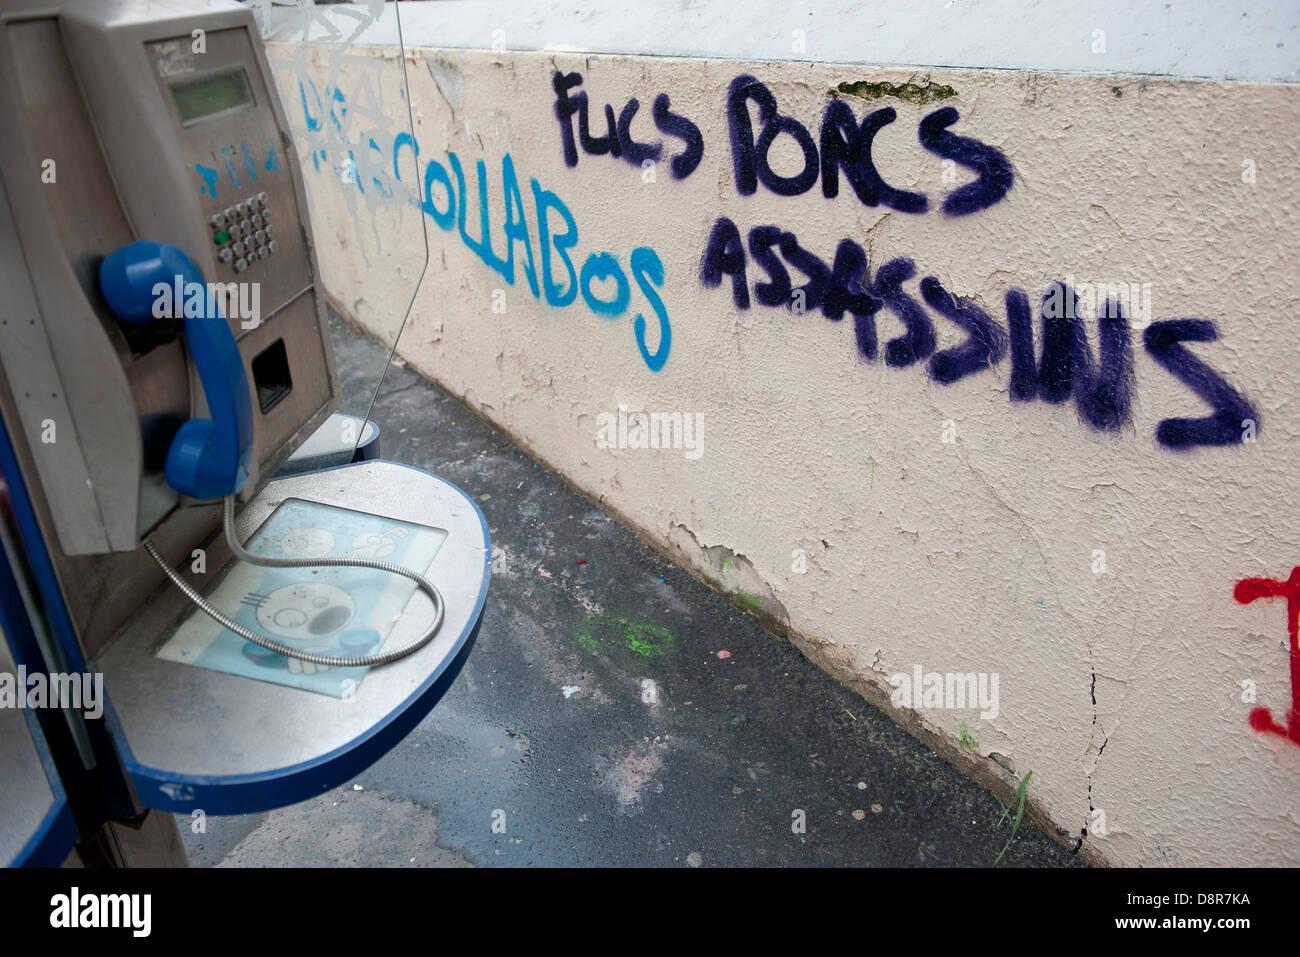 Graffiti painted on wall near payphone - Stock Image